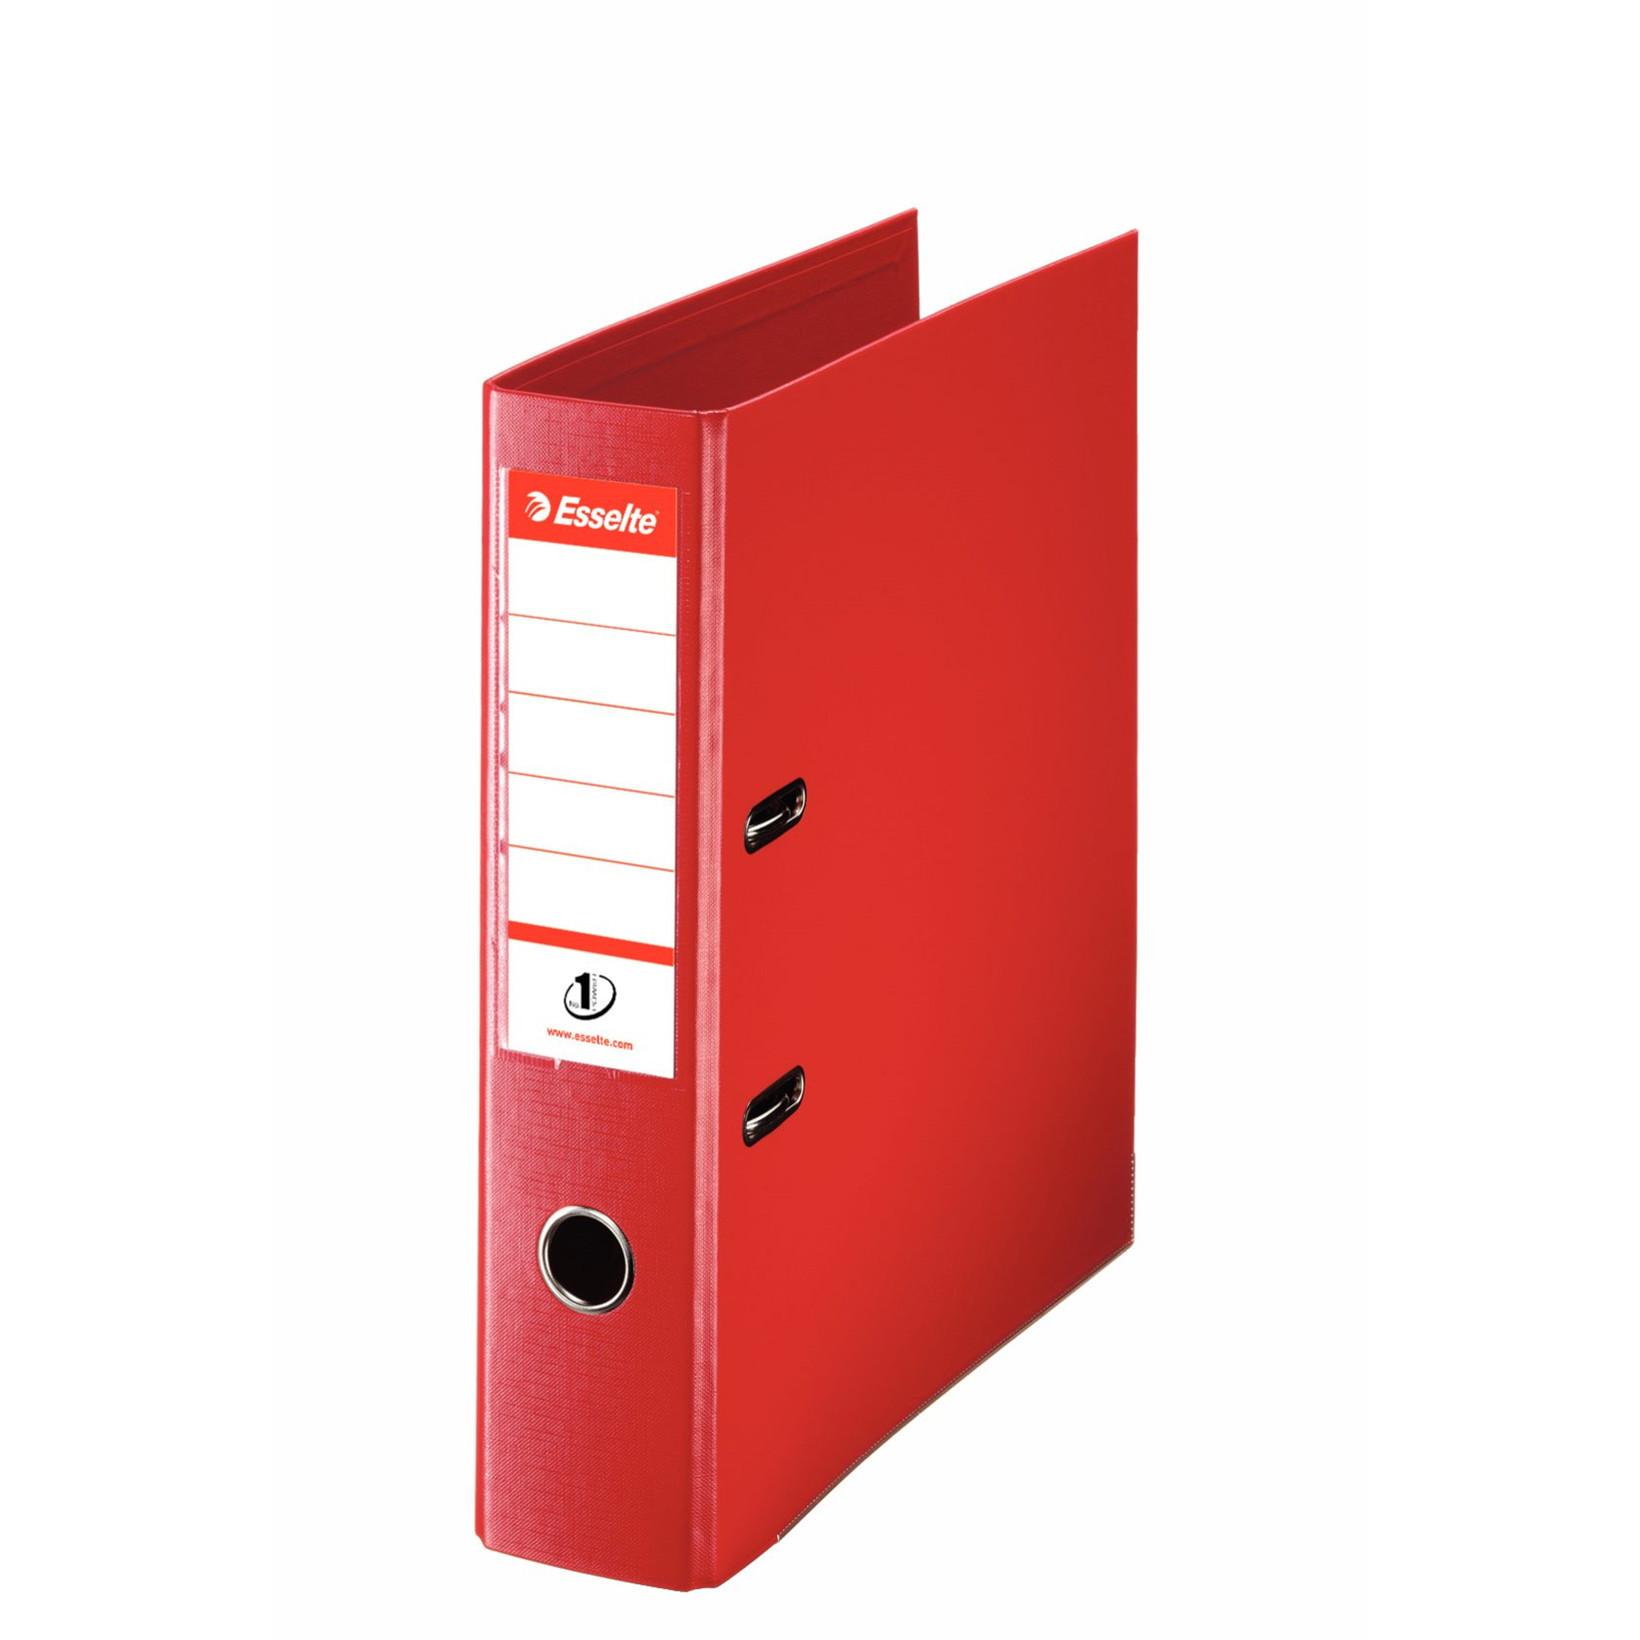 Esselte No 1 brevordner A4 med 75 mm ryg 811330 - Rød